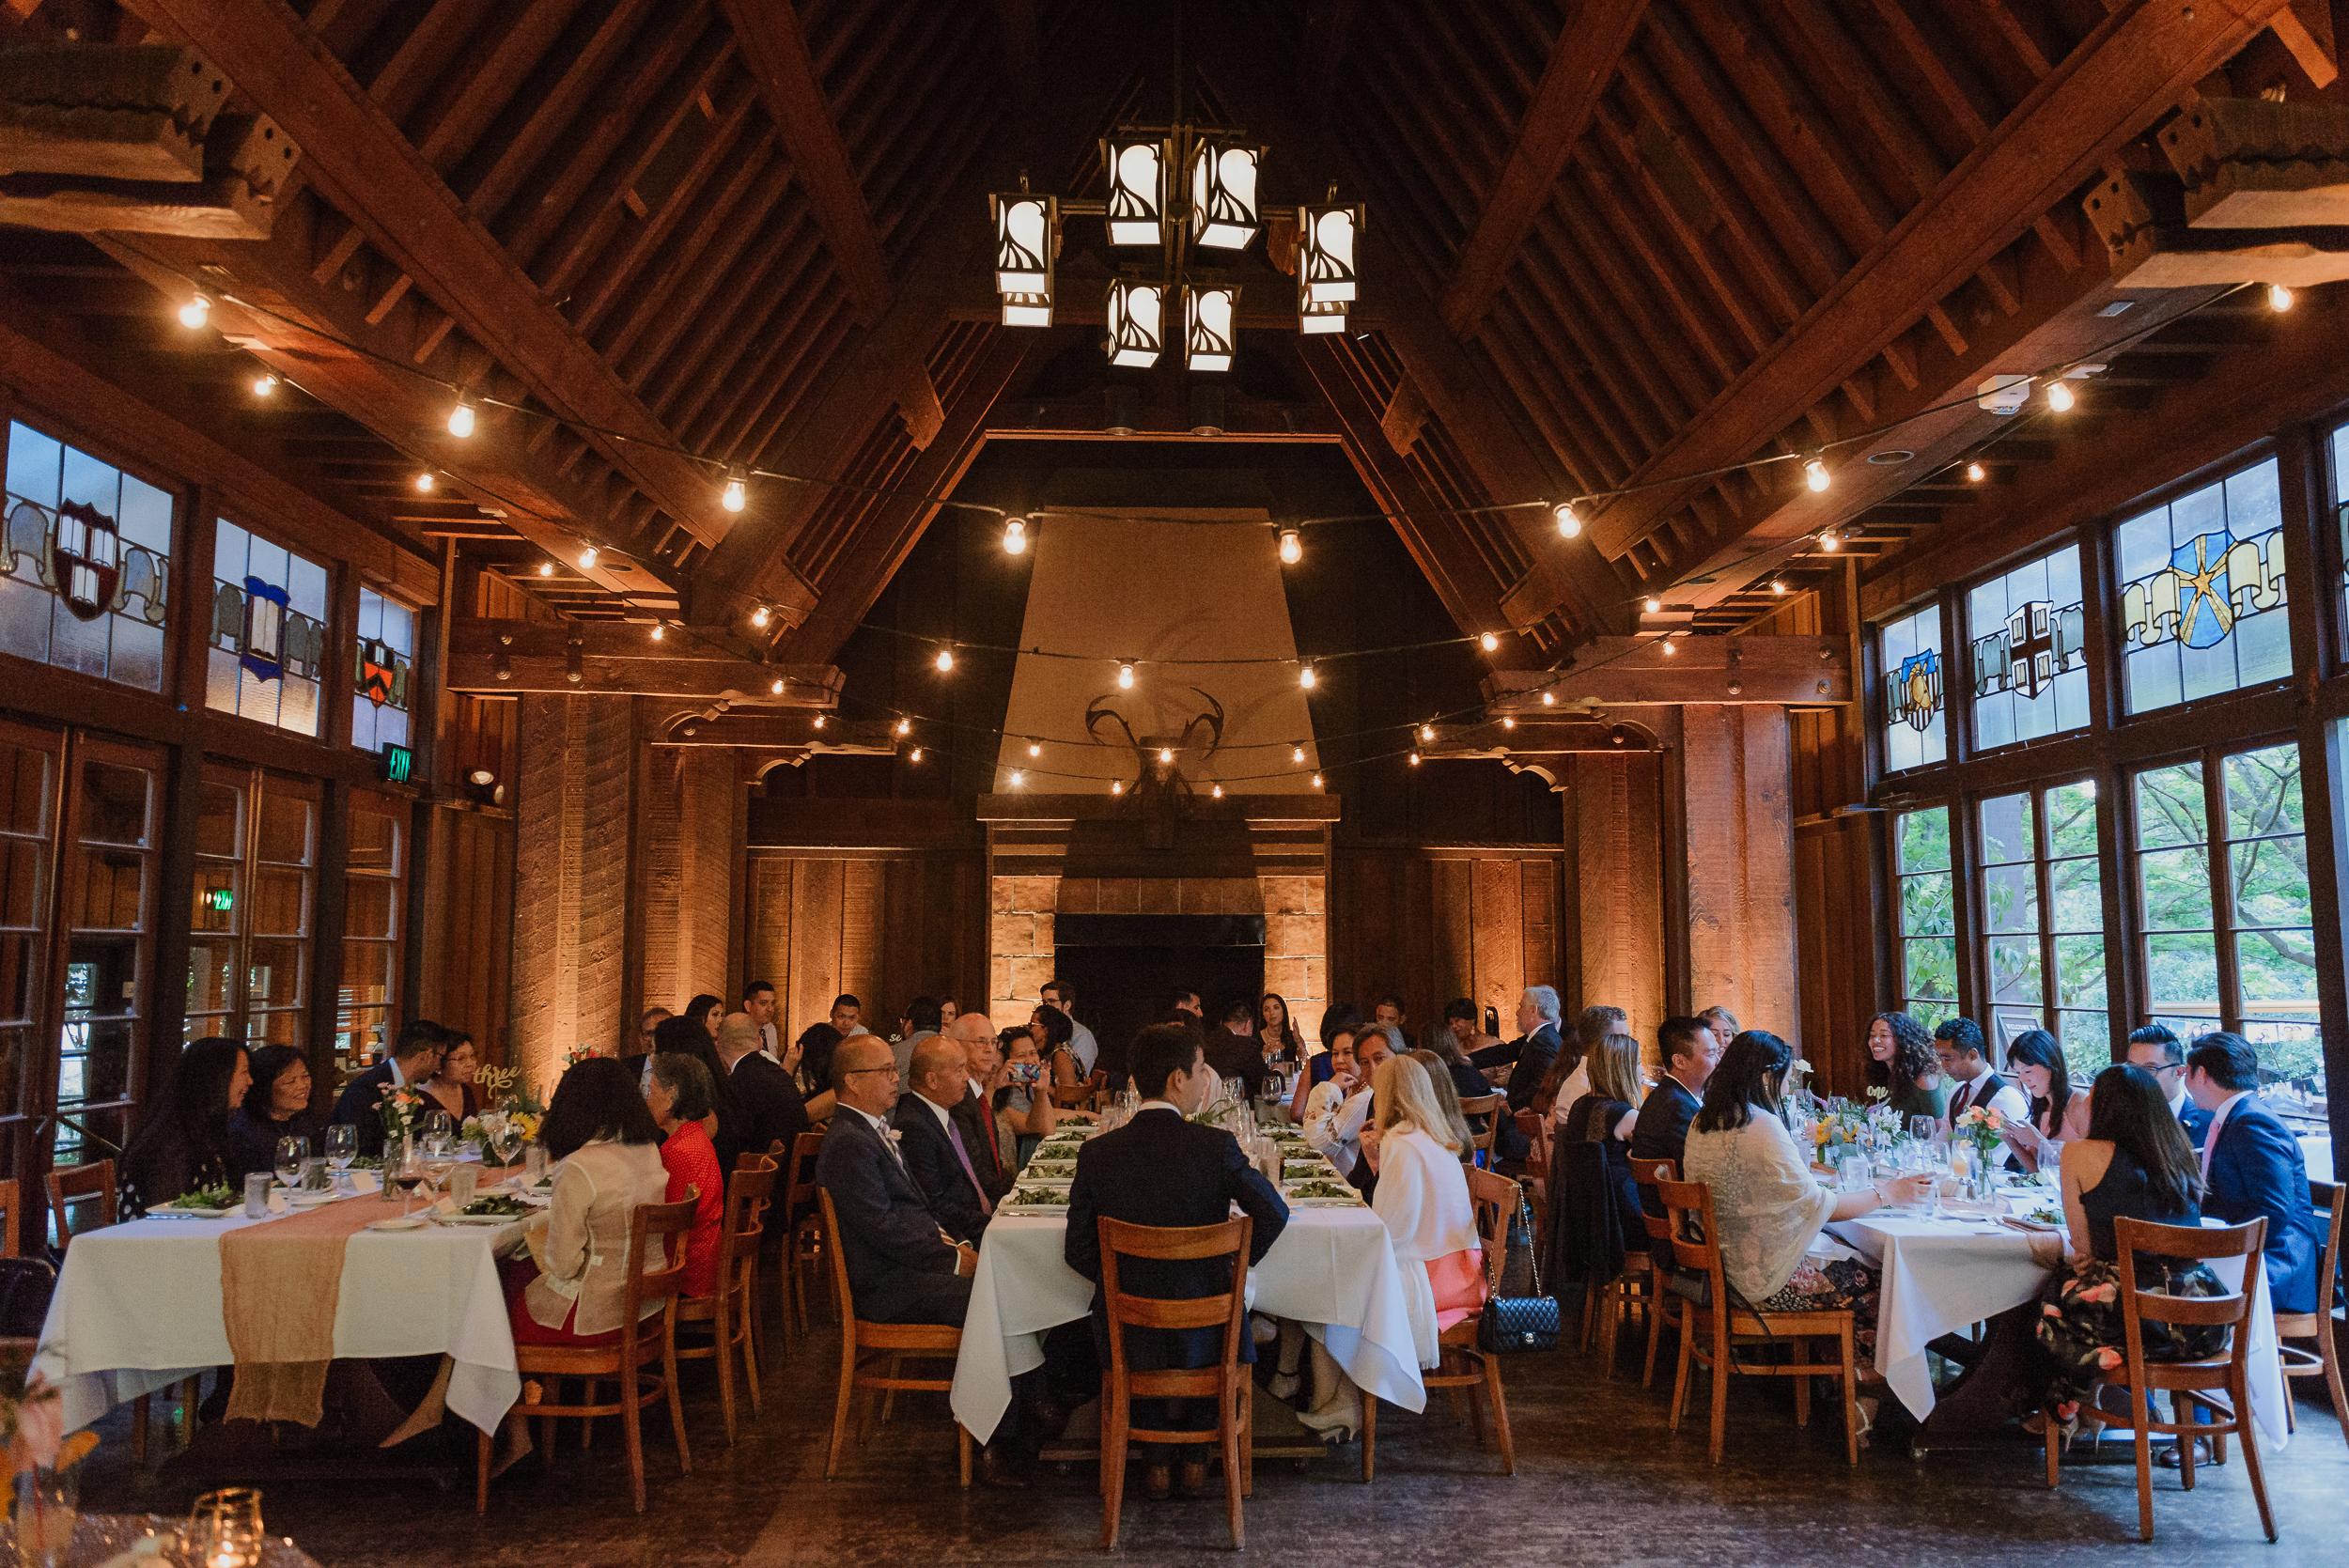 57-berkeley-uc-faculty-club-wedding-kb-vivianchen-360.jpg